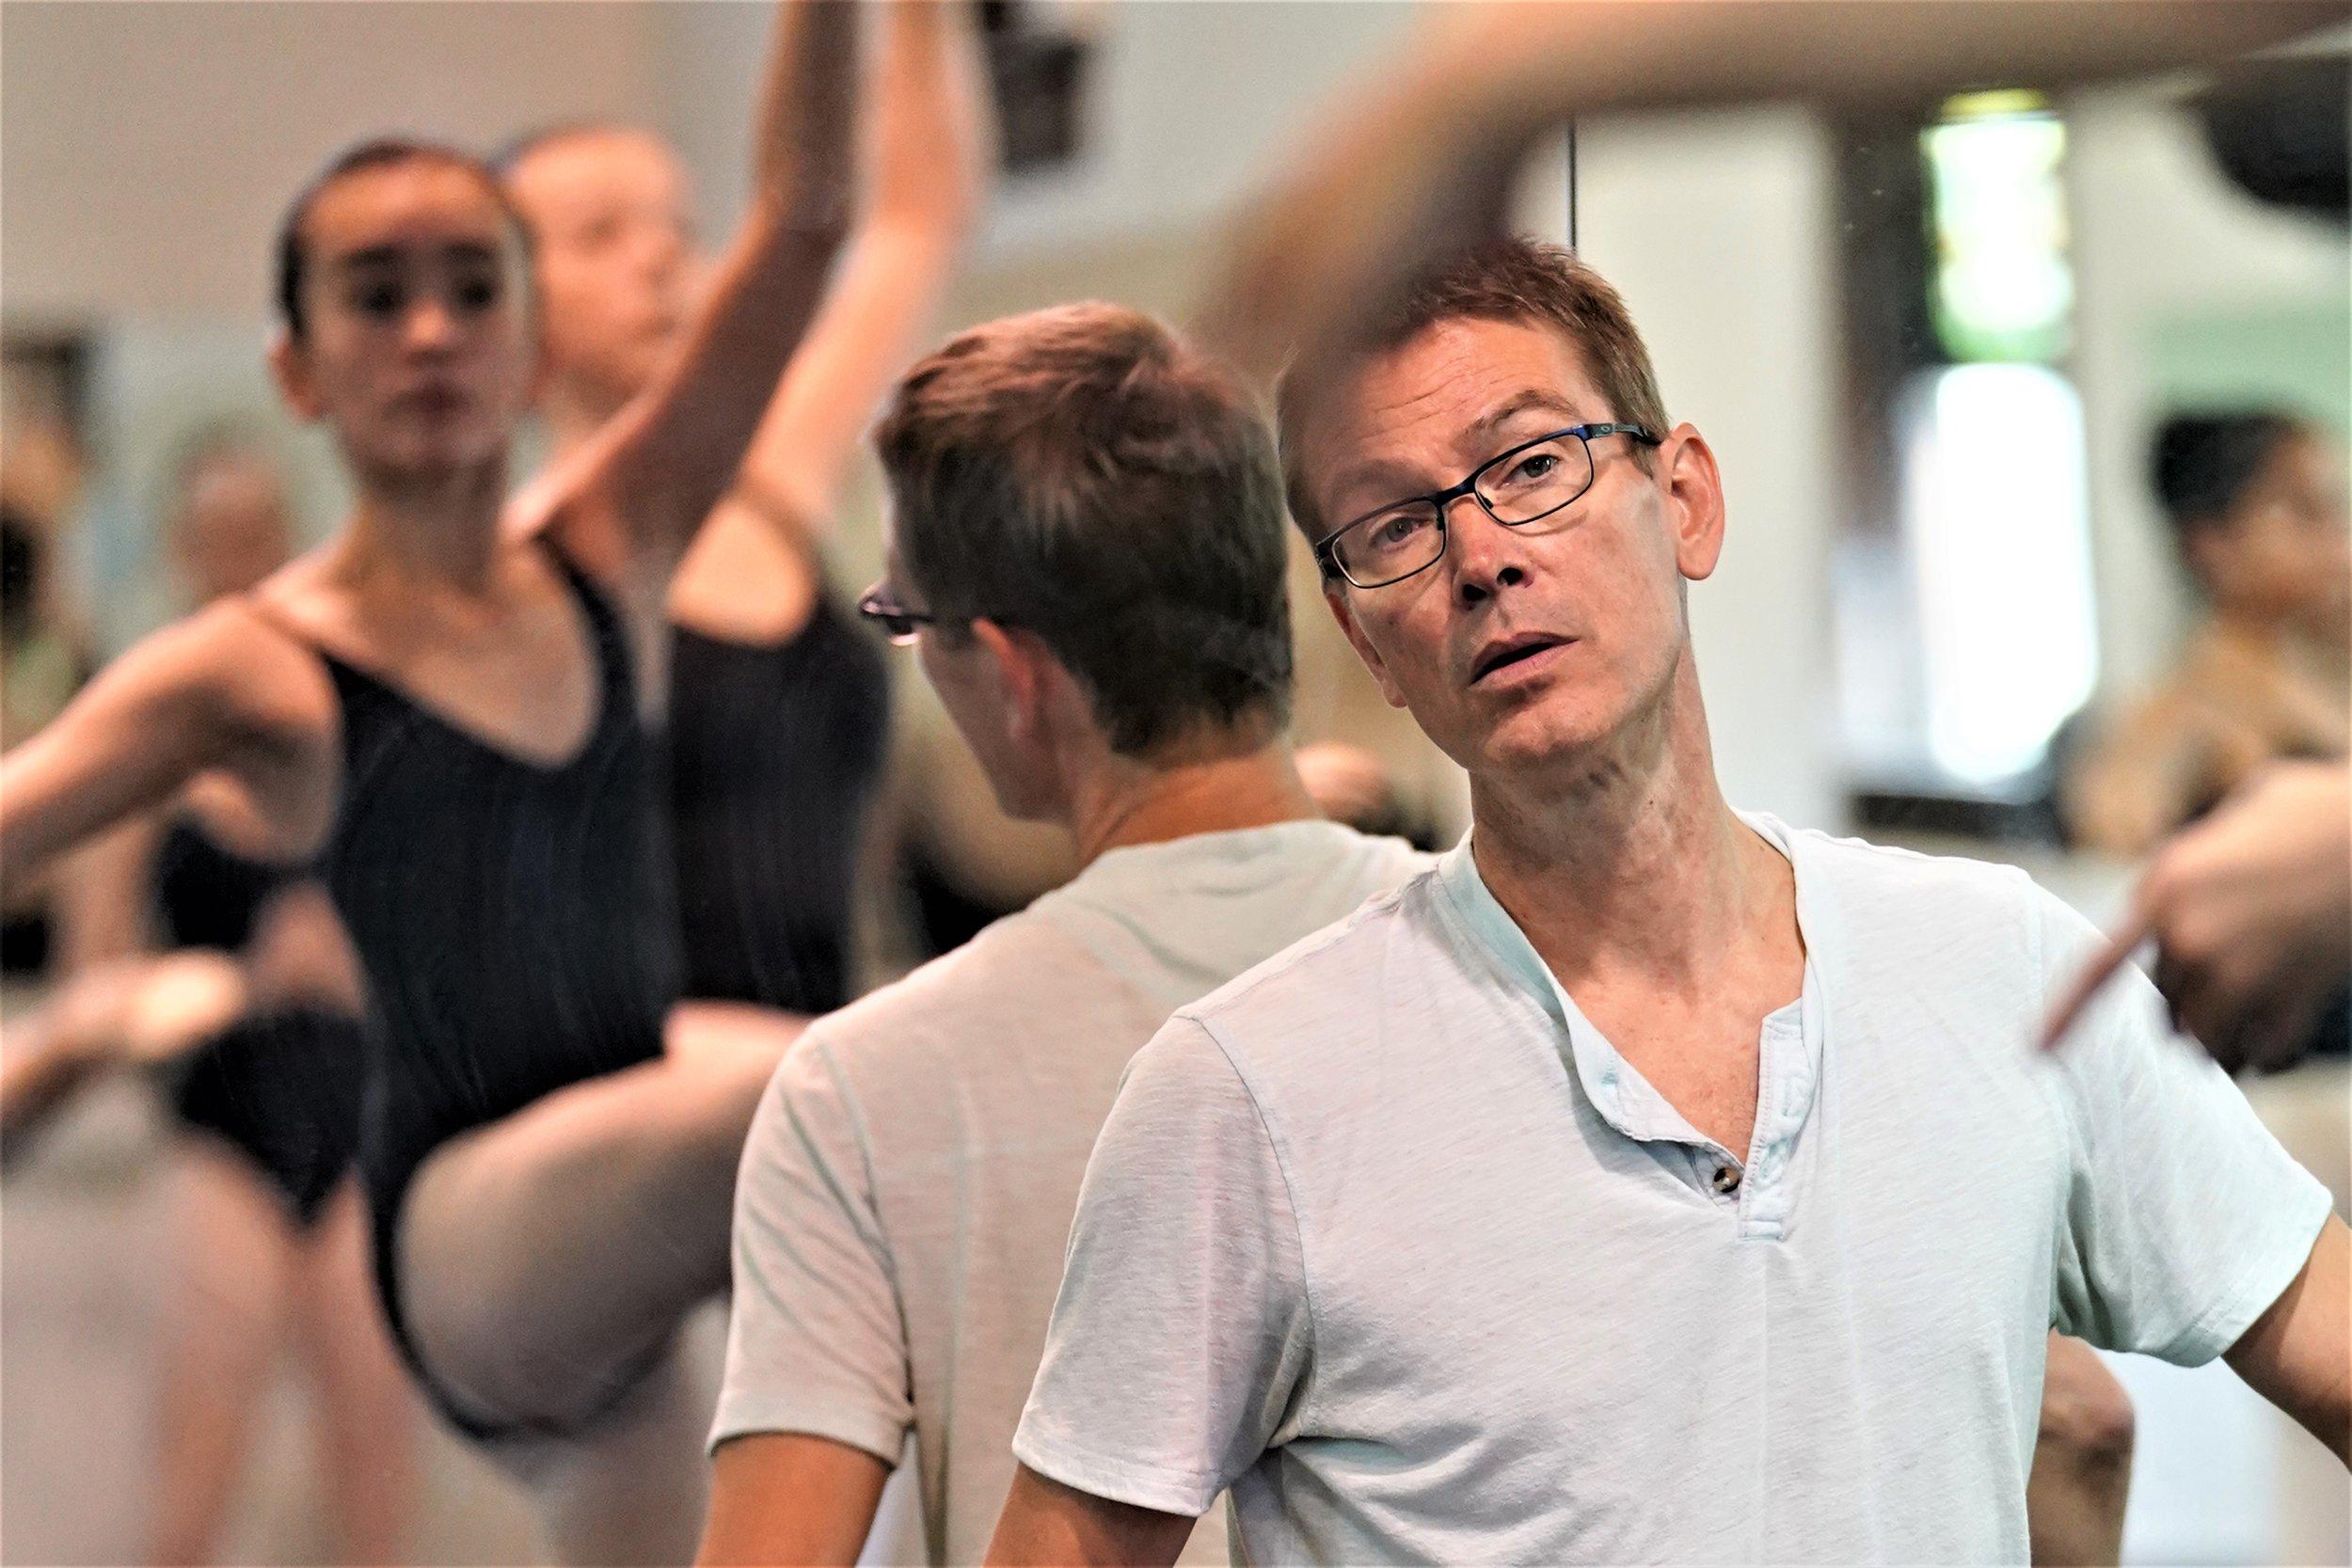 Summer Faculty Member Laszlo Berdo teaching Fourth & Fifth Year Dancers